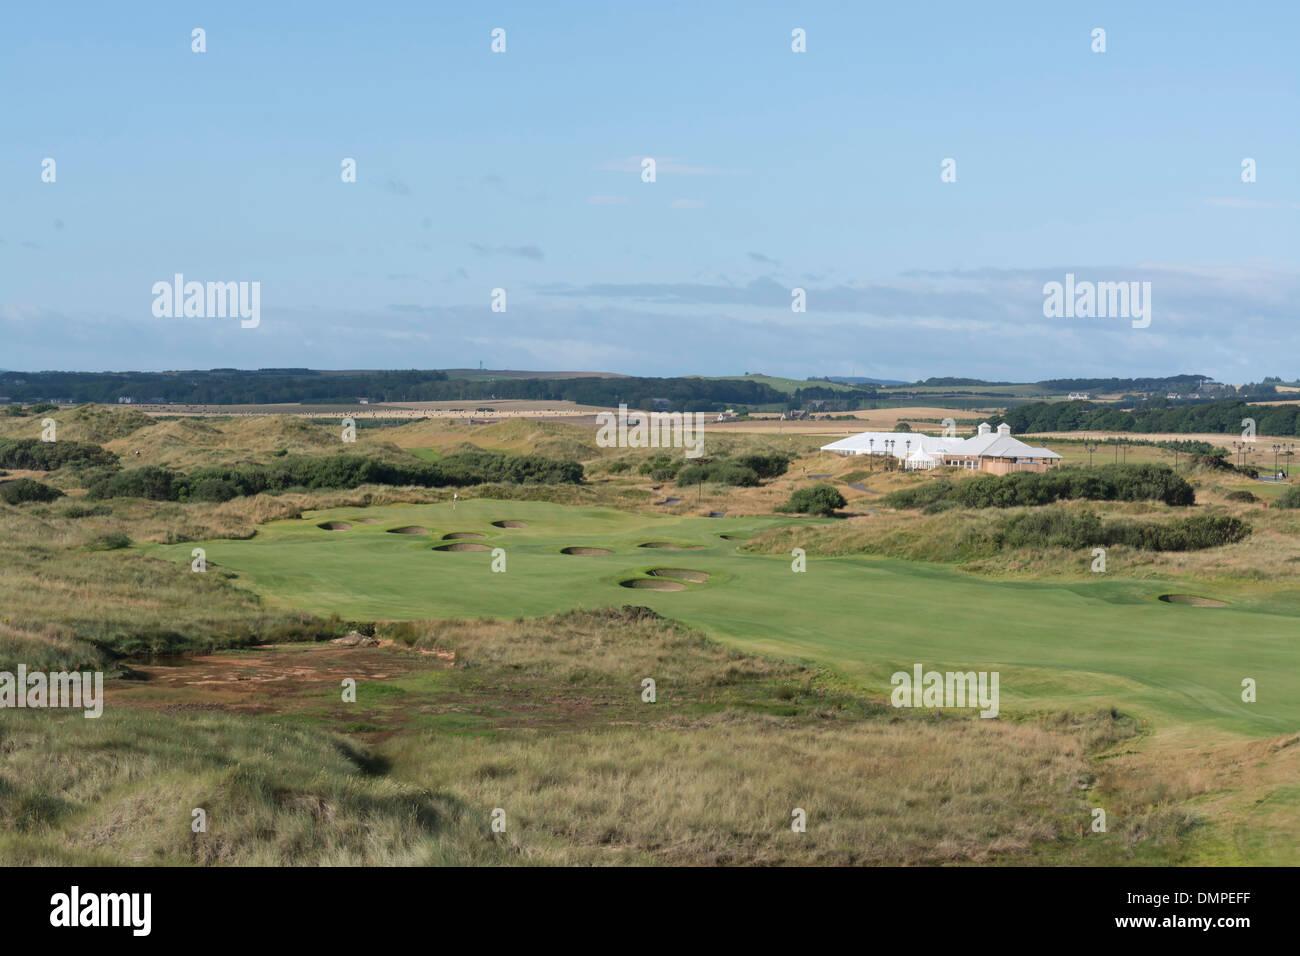 trump international golf course controversy - Stock Image